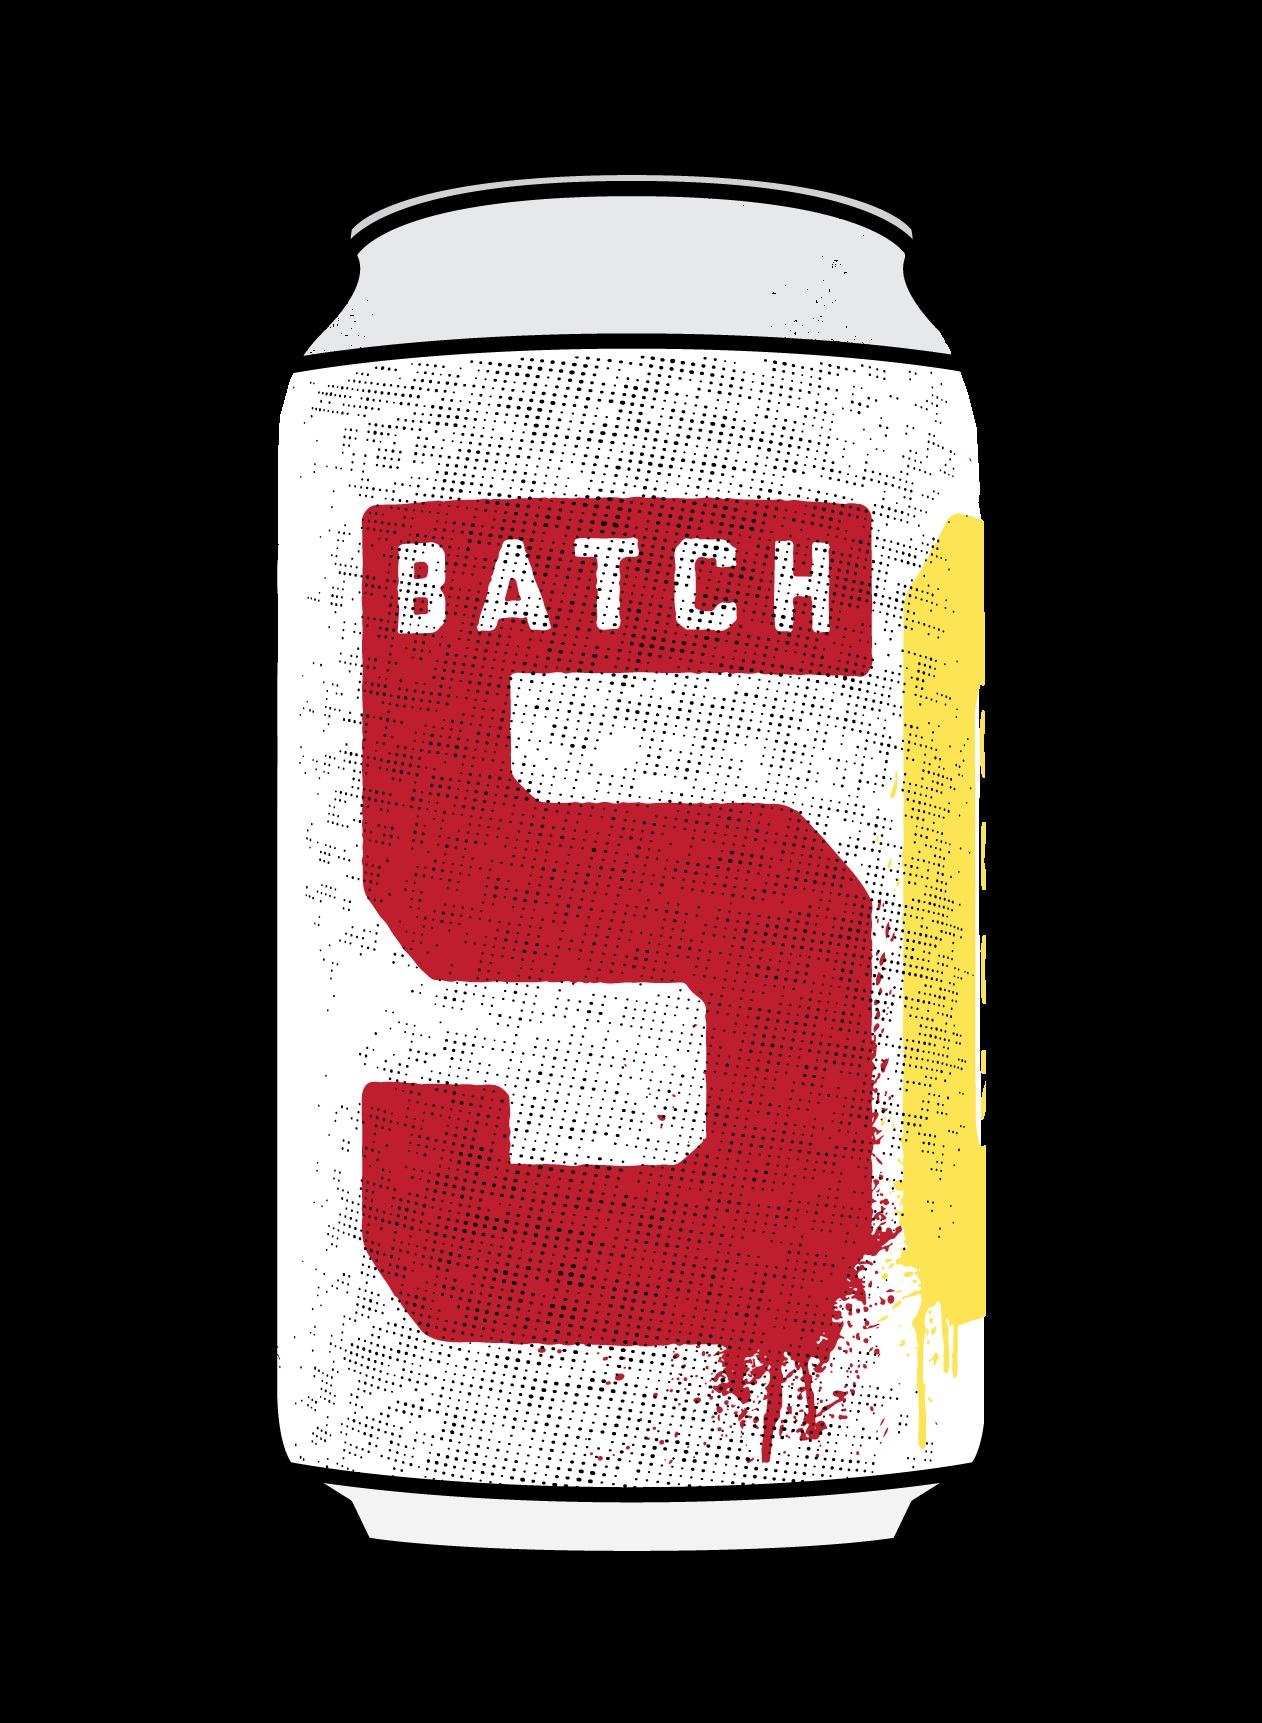 Batch 500 Image